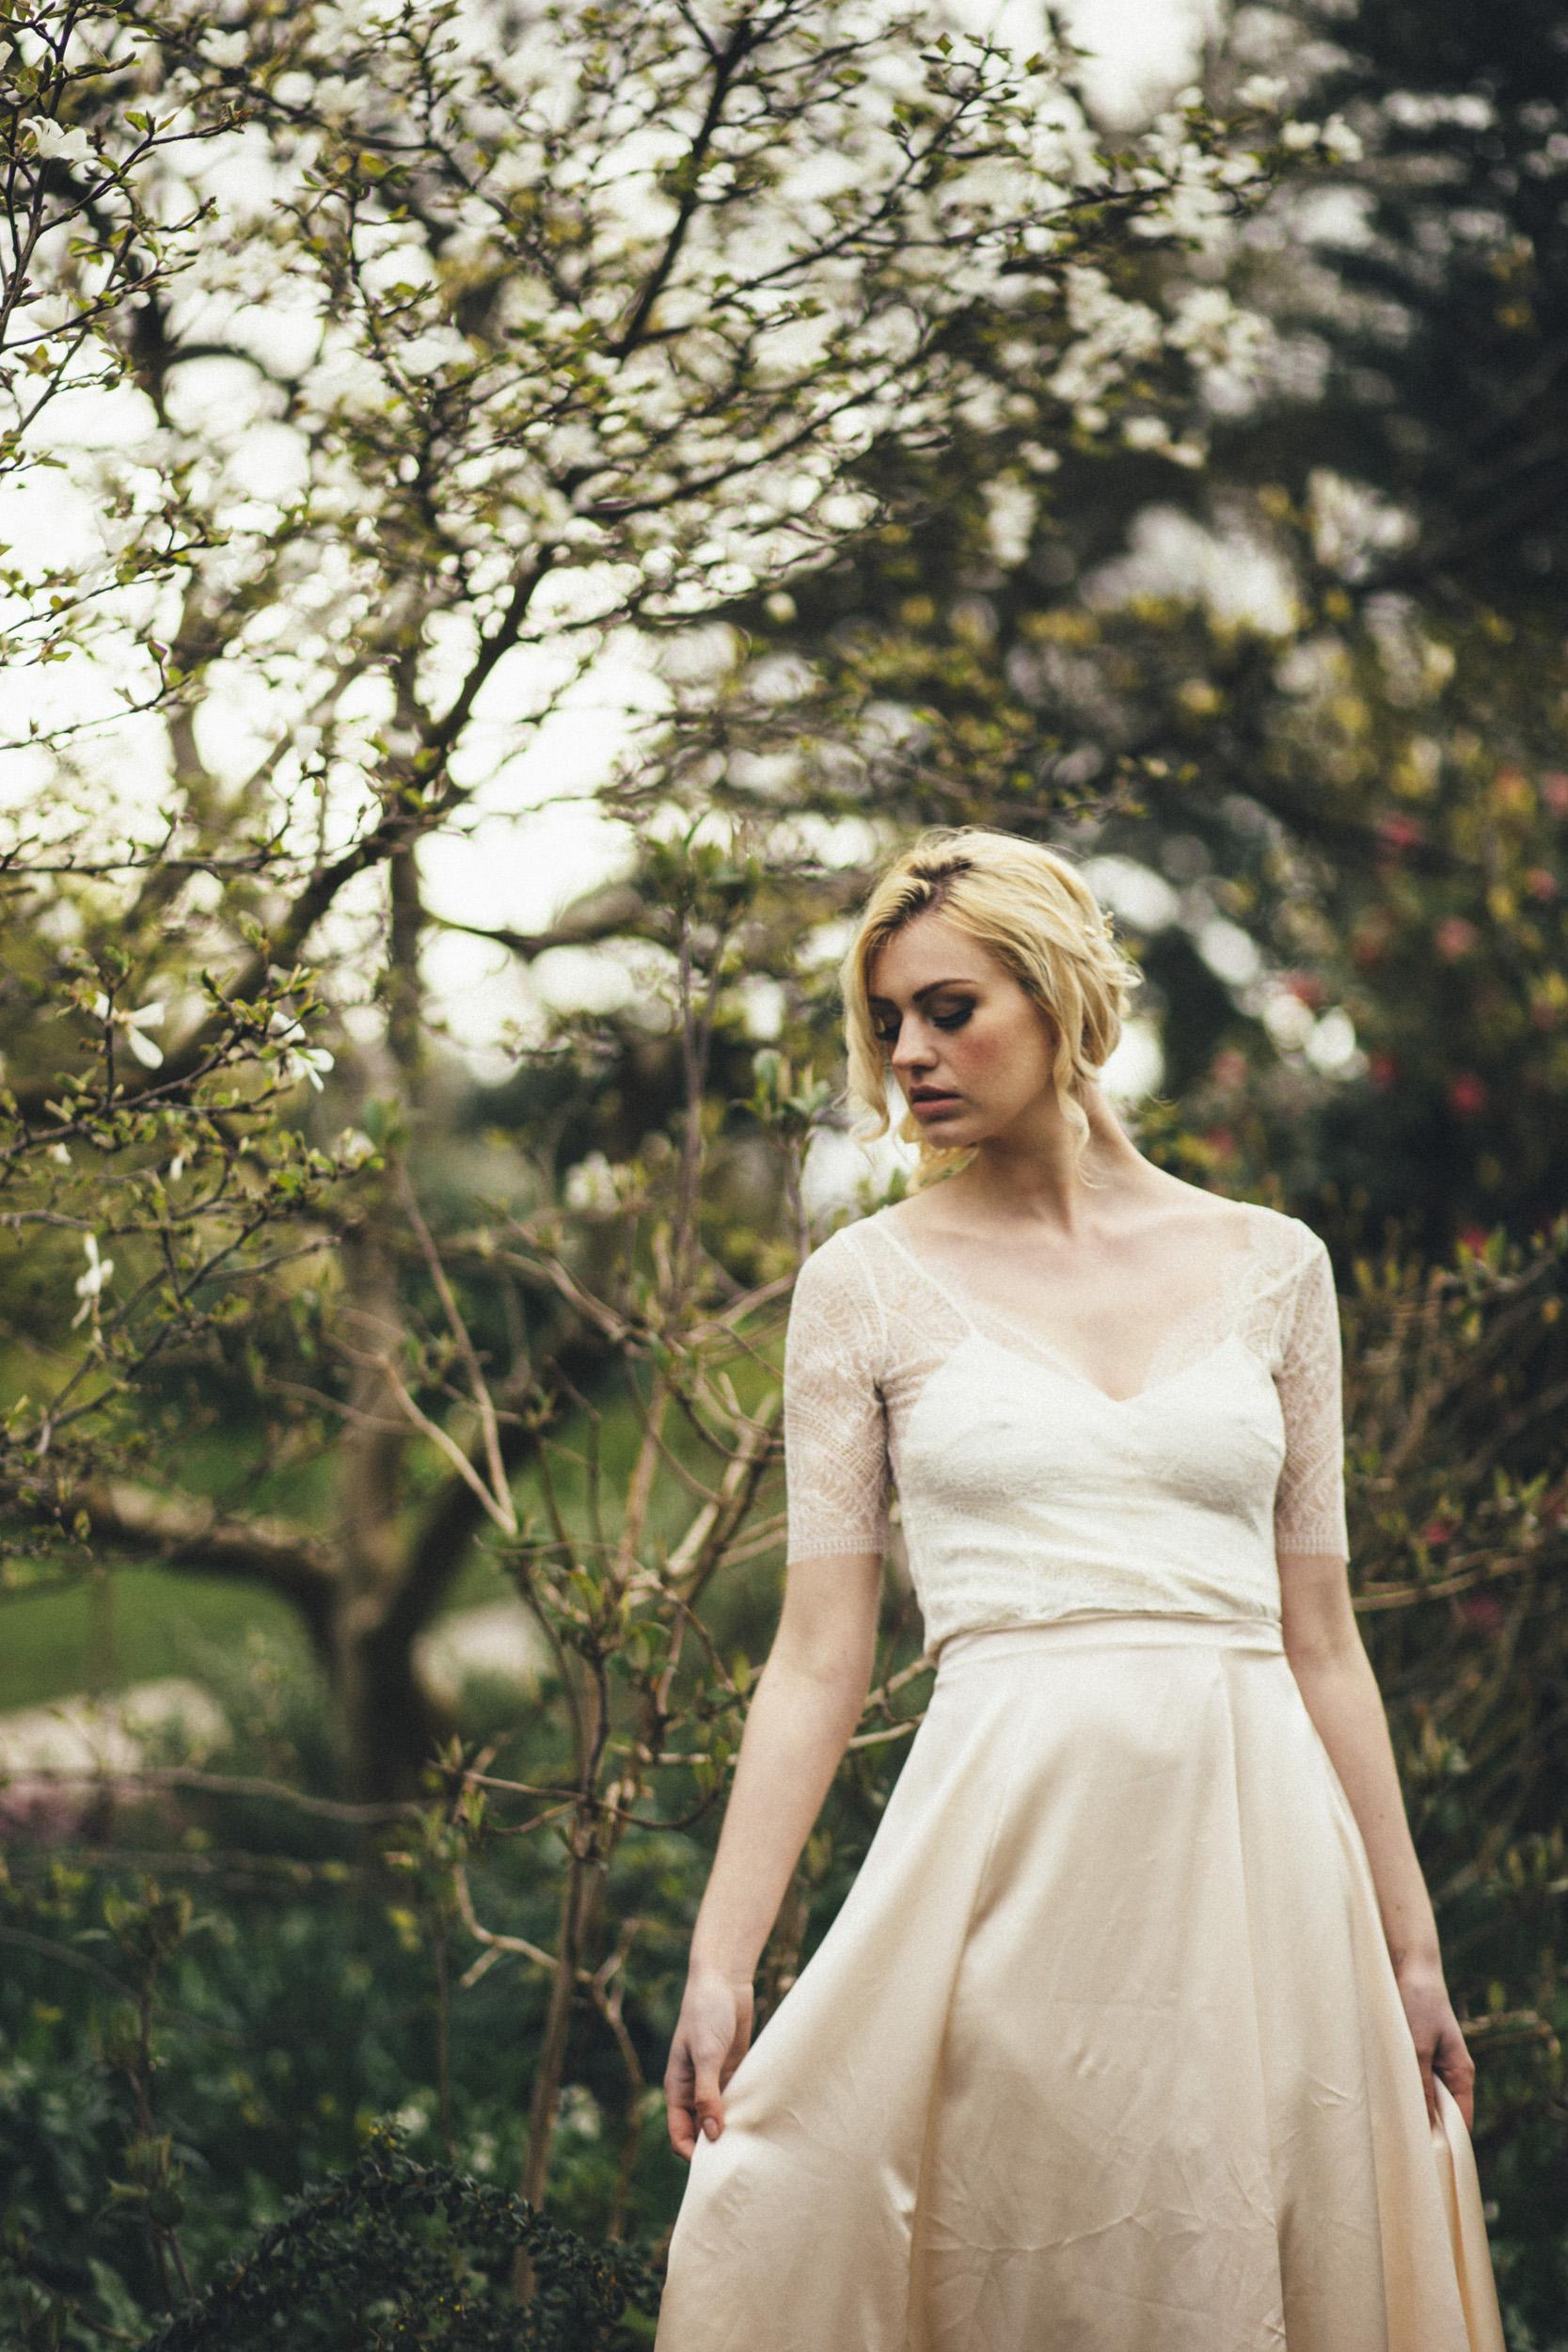 Spring-Bridal-Kate-Beaumont-Shelley-Richmond-Vintage-Wedding-Dress-11.jpg